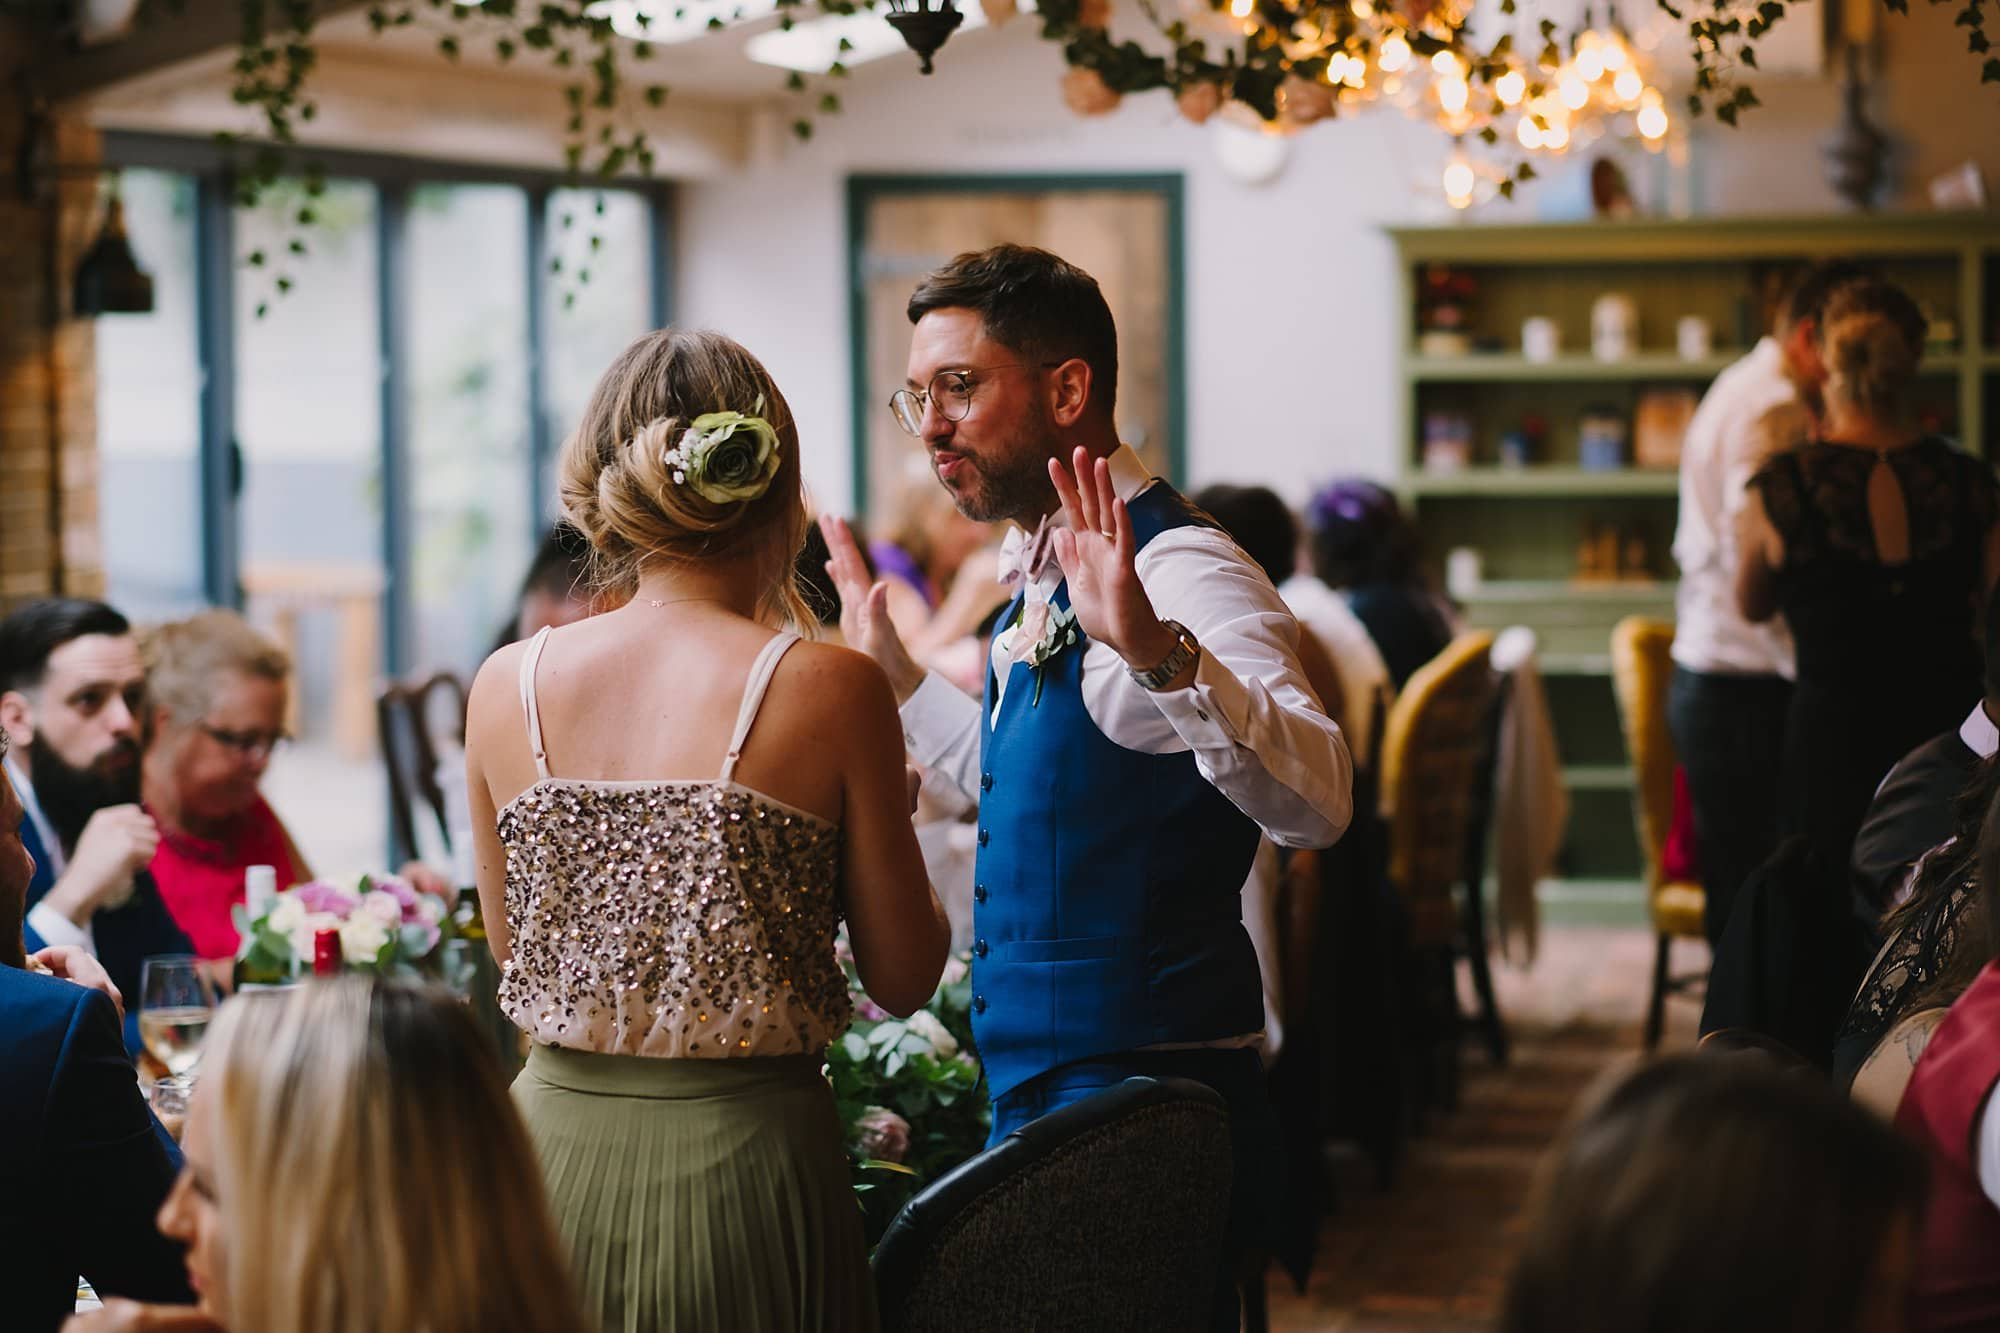 london pub wedding photographer jn 033 - The County Arms Wedding Photographer   Jen & Nick